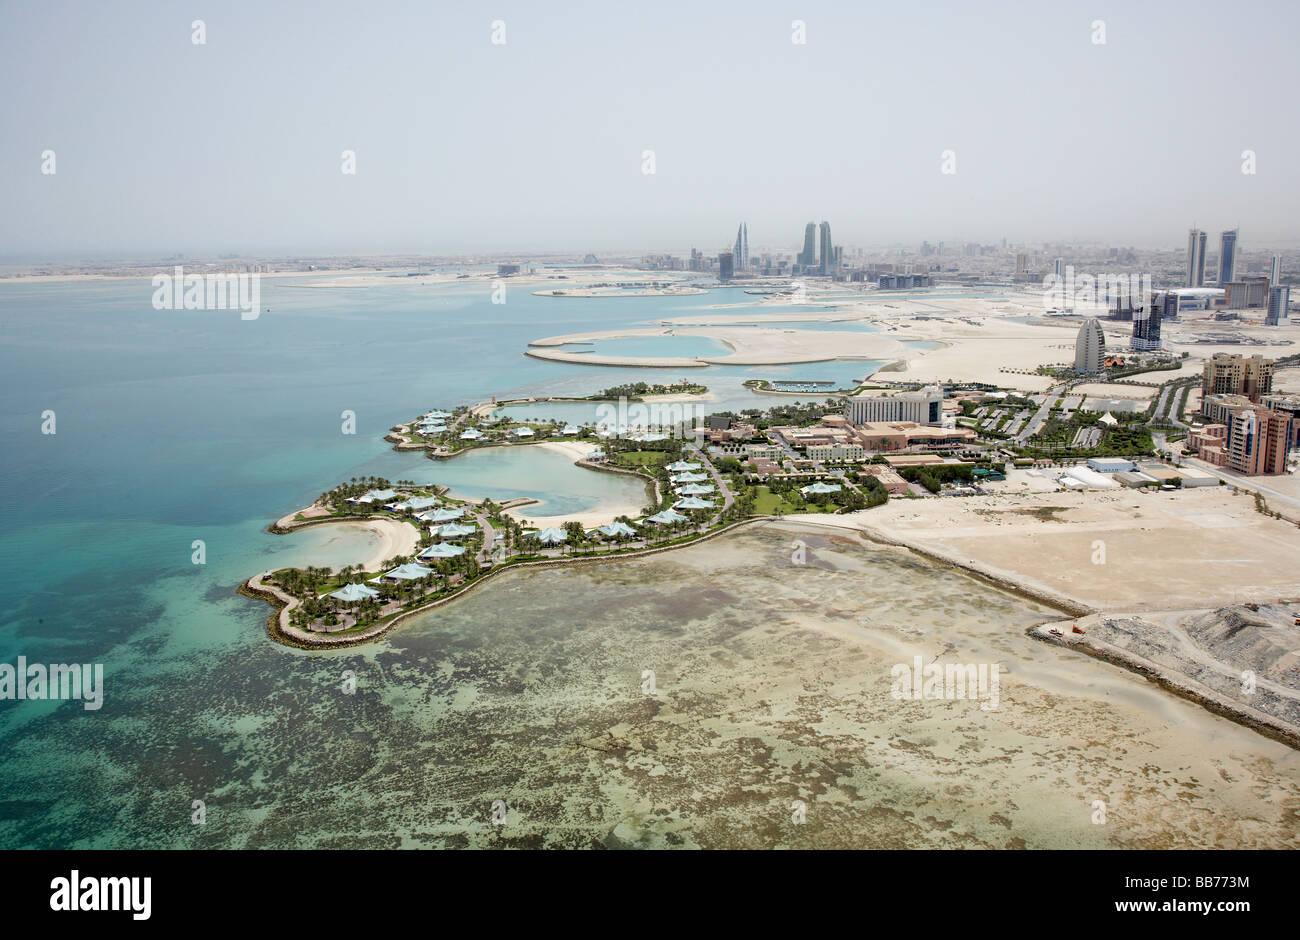 Photographie aérienne du Ritz Carlton Hotel and Resort Manama Bahrain Photo Stock